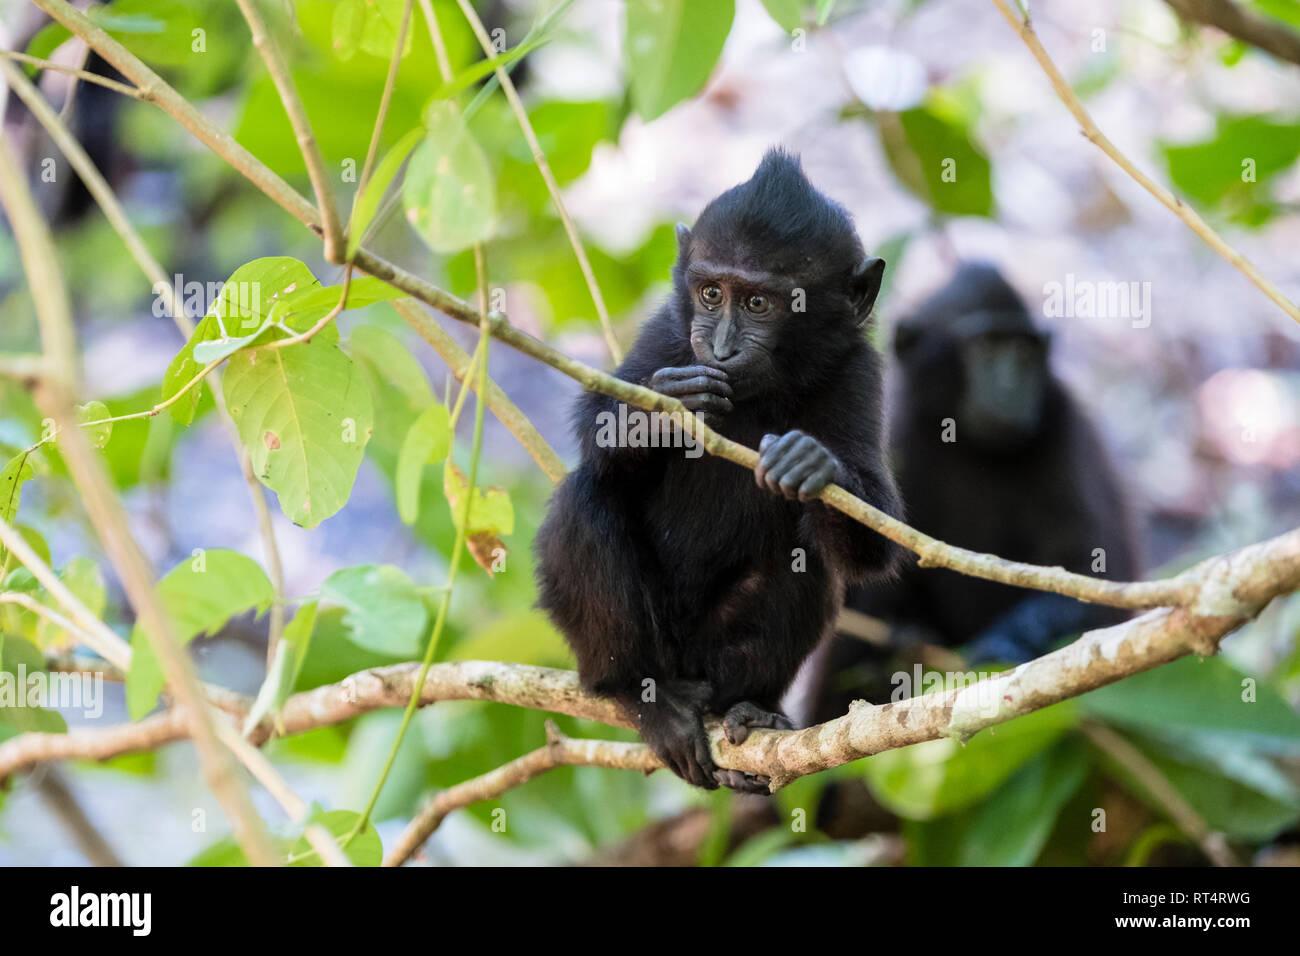 Celebes Crested Macaque (Macaca nigra), Tangkoko National Park, Sulawesi, Indonesia Stock Photo